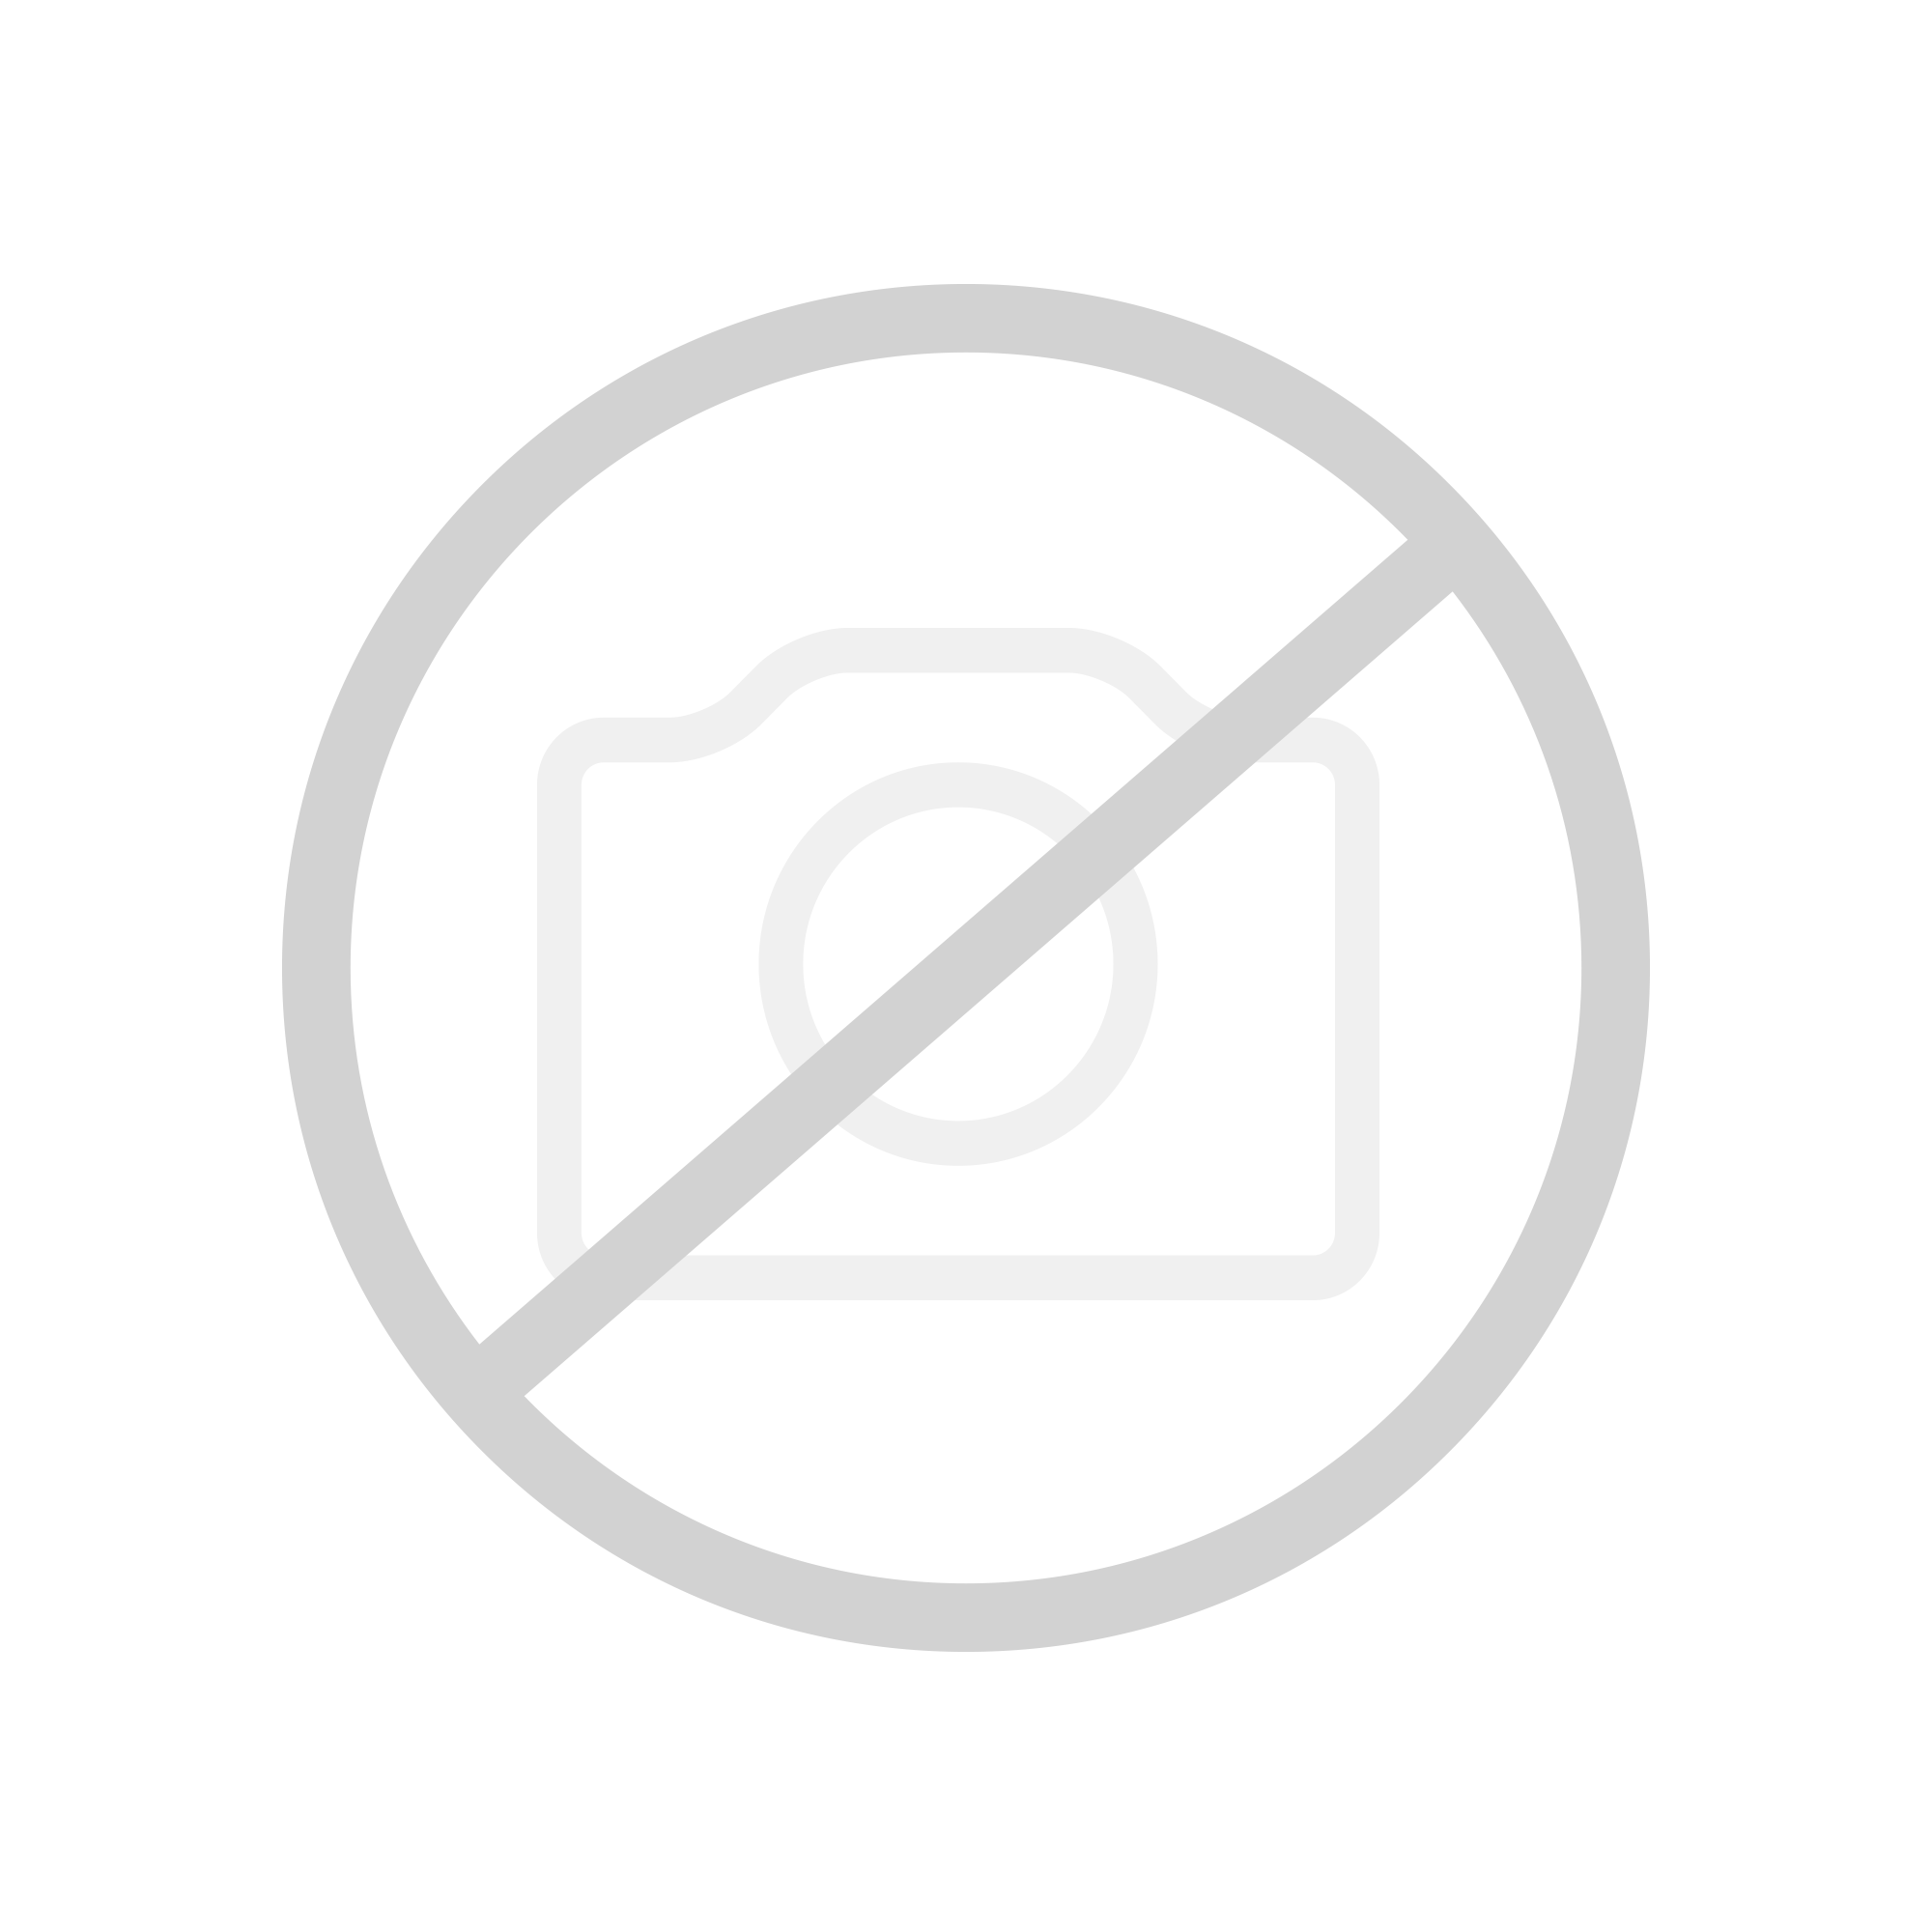 Hansgrohe Croma 100 1jet / Porter´S Set 1600 mm 27575000